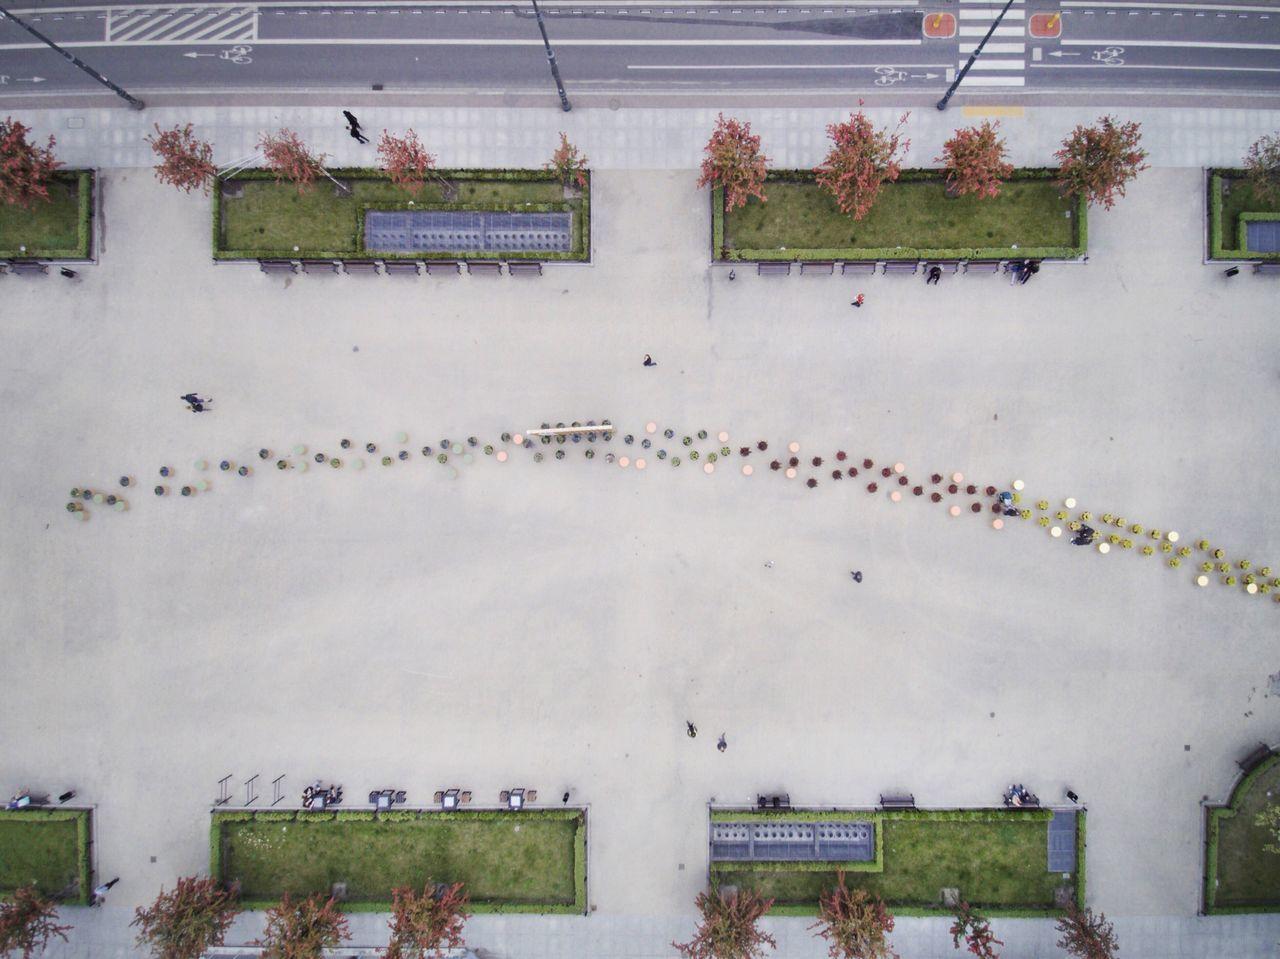 Dronephotography Drone  Plaza City Above Pattern Cityscape